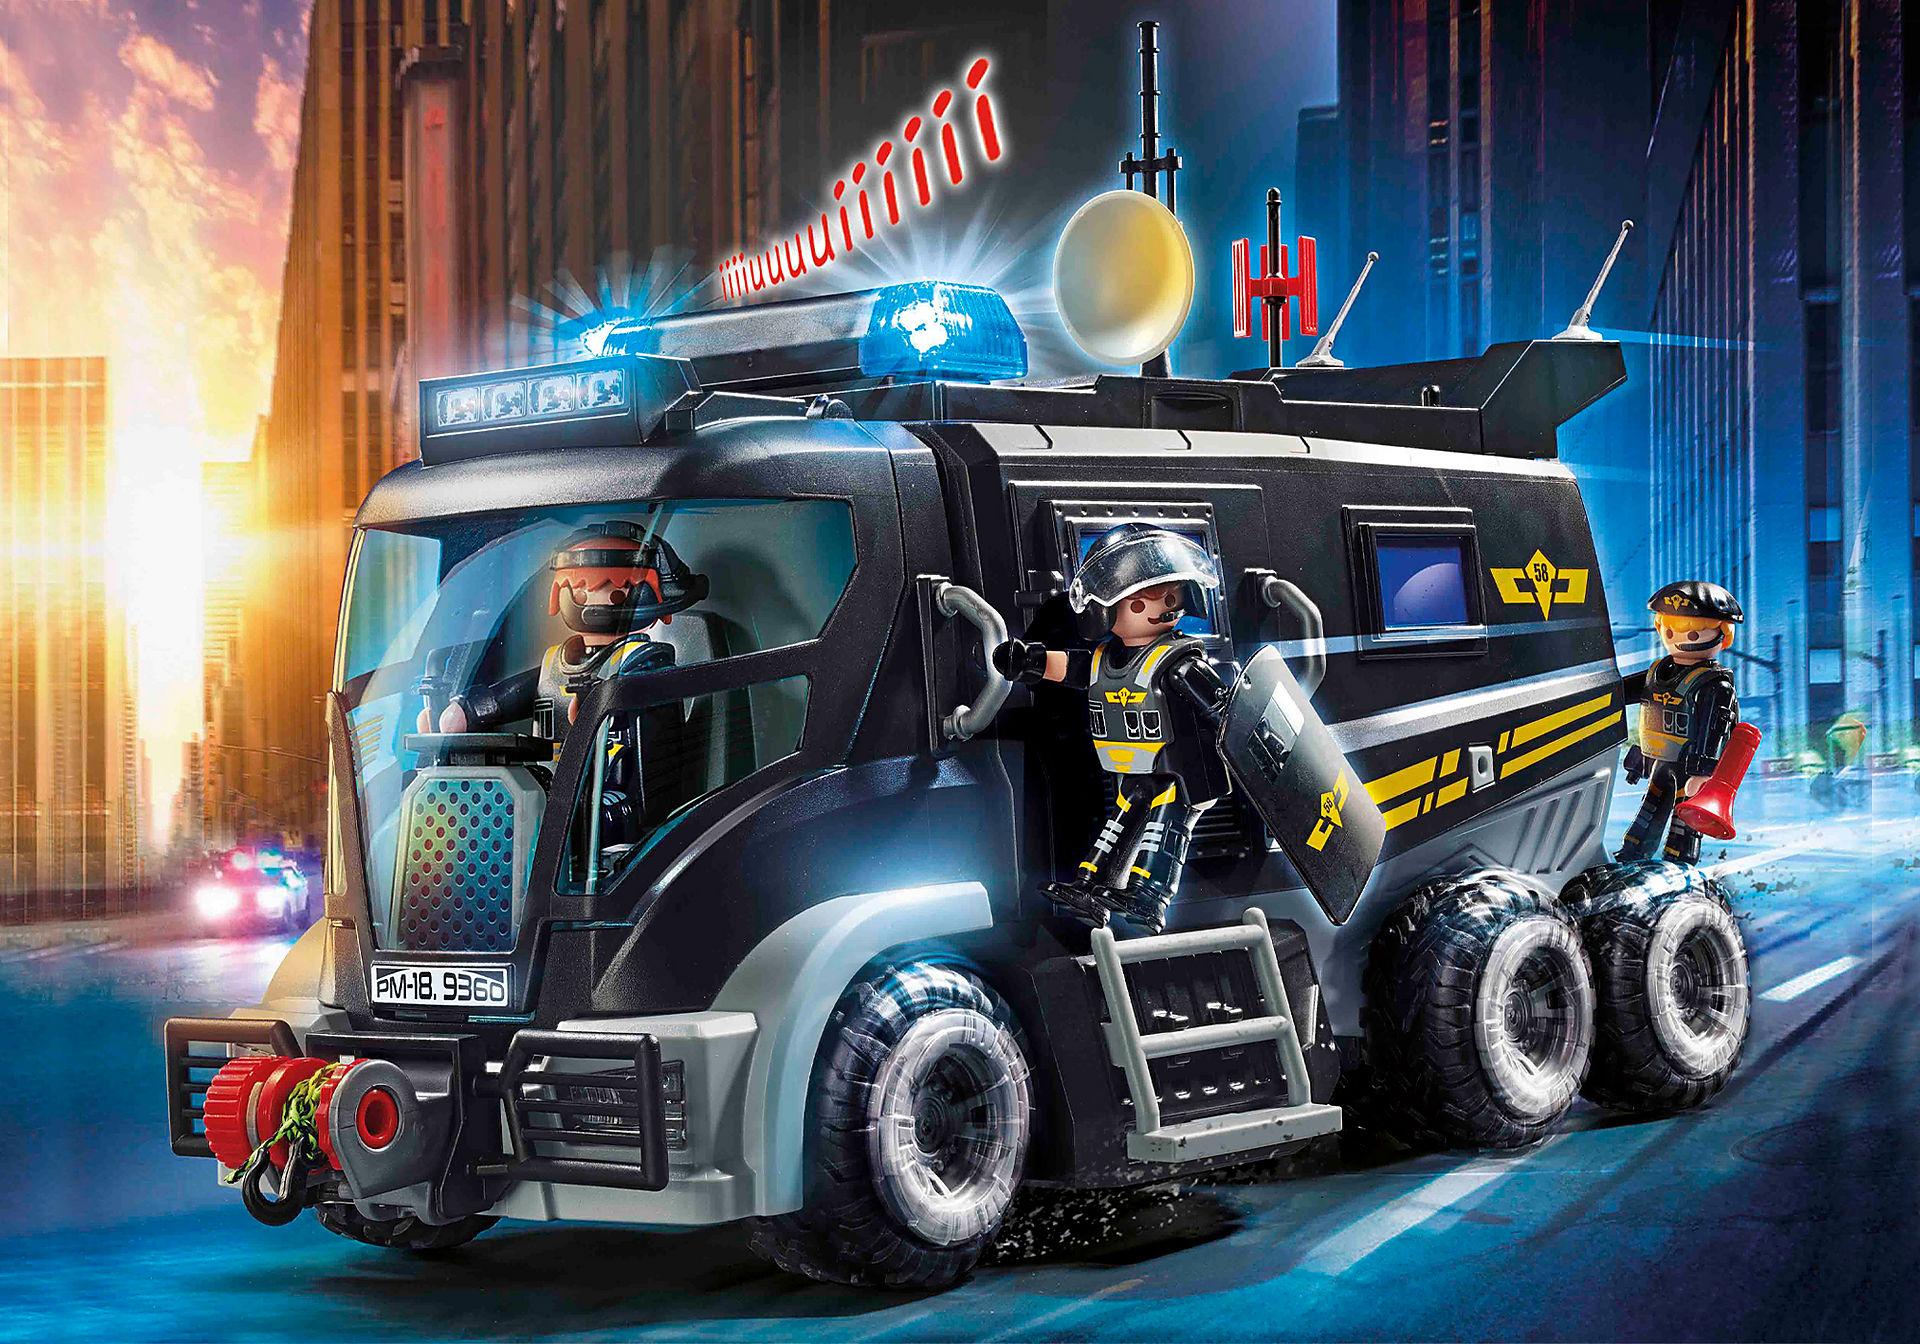 http://media.playmobil.com/i/playmobil/9360_product_detail/SEK-Truck mit Licht und Sound